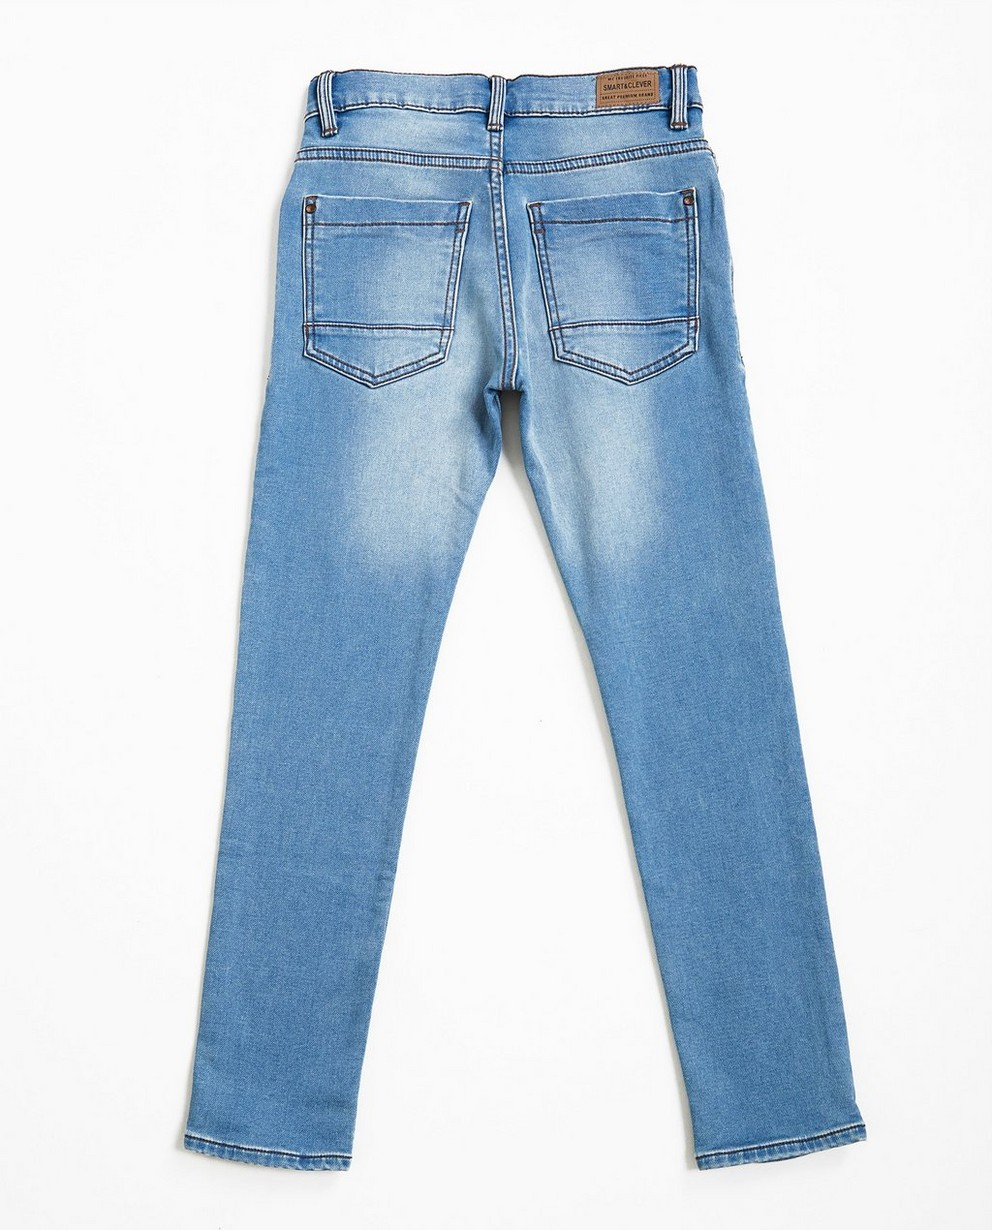 Jeans - light turquise - Lichtblauwe slim jeans